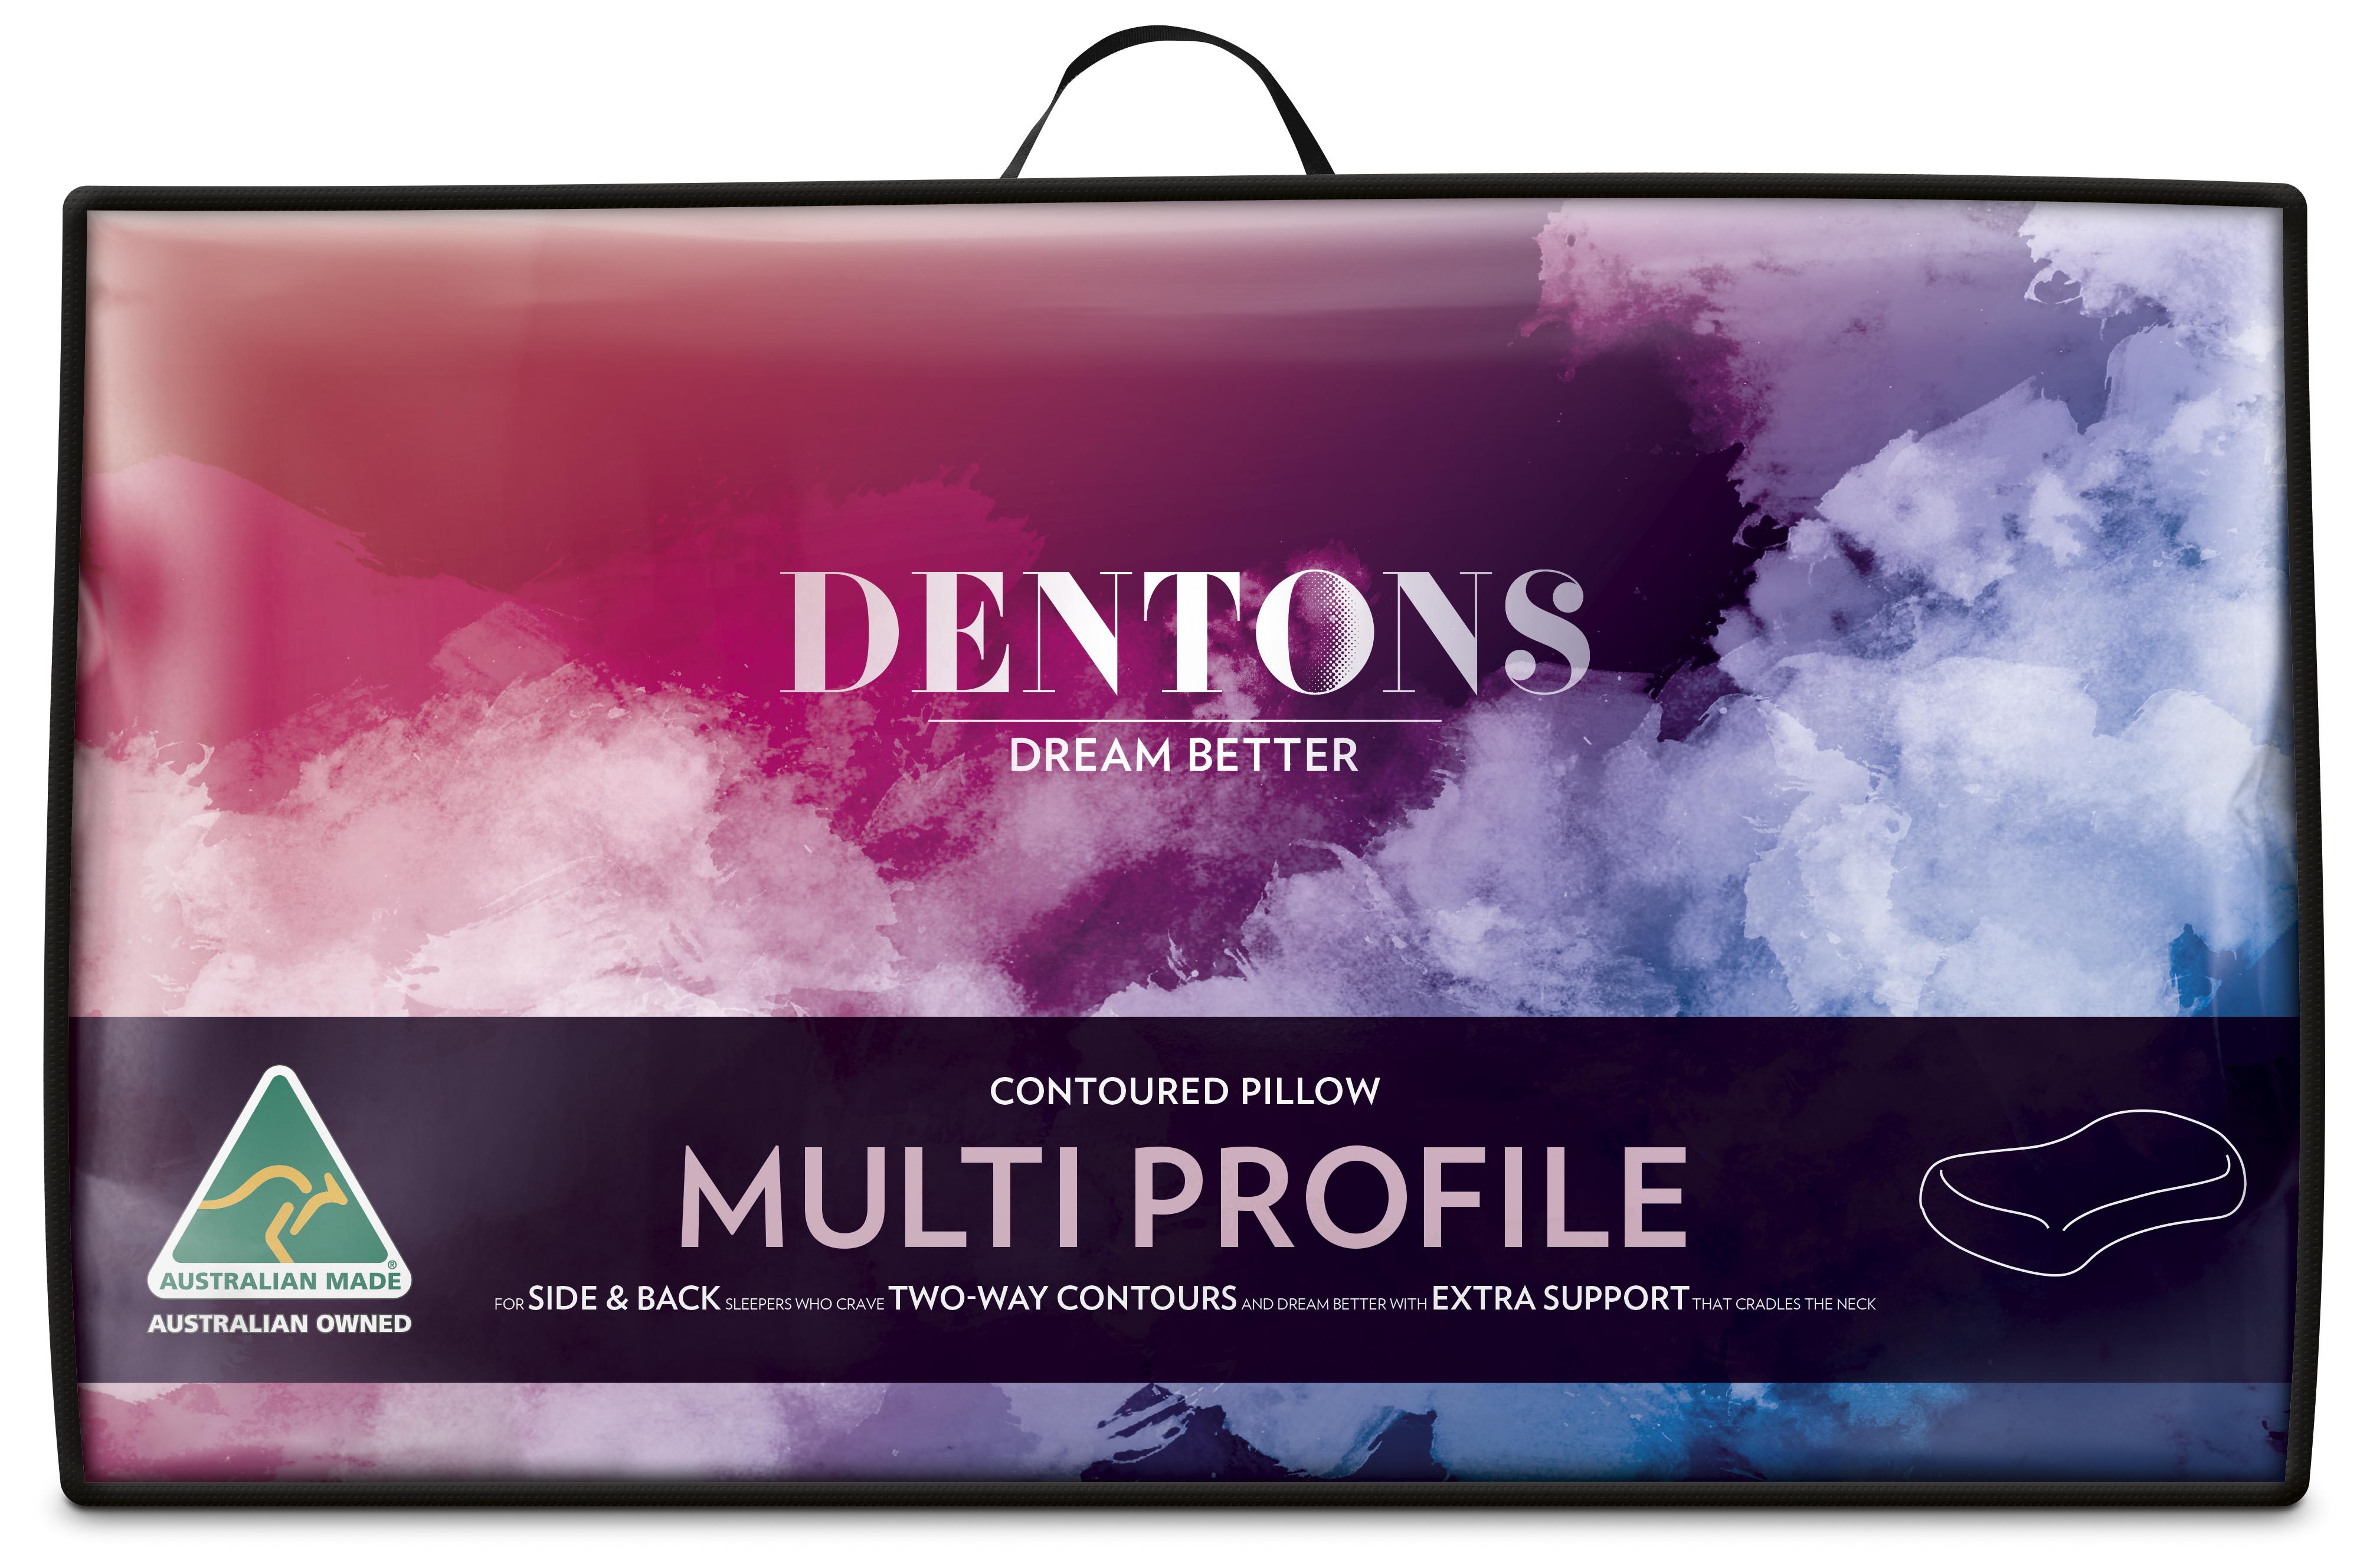 Dentons – Contoured Multi Profile Pillow